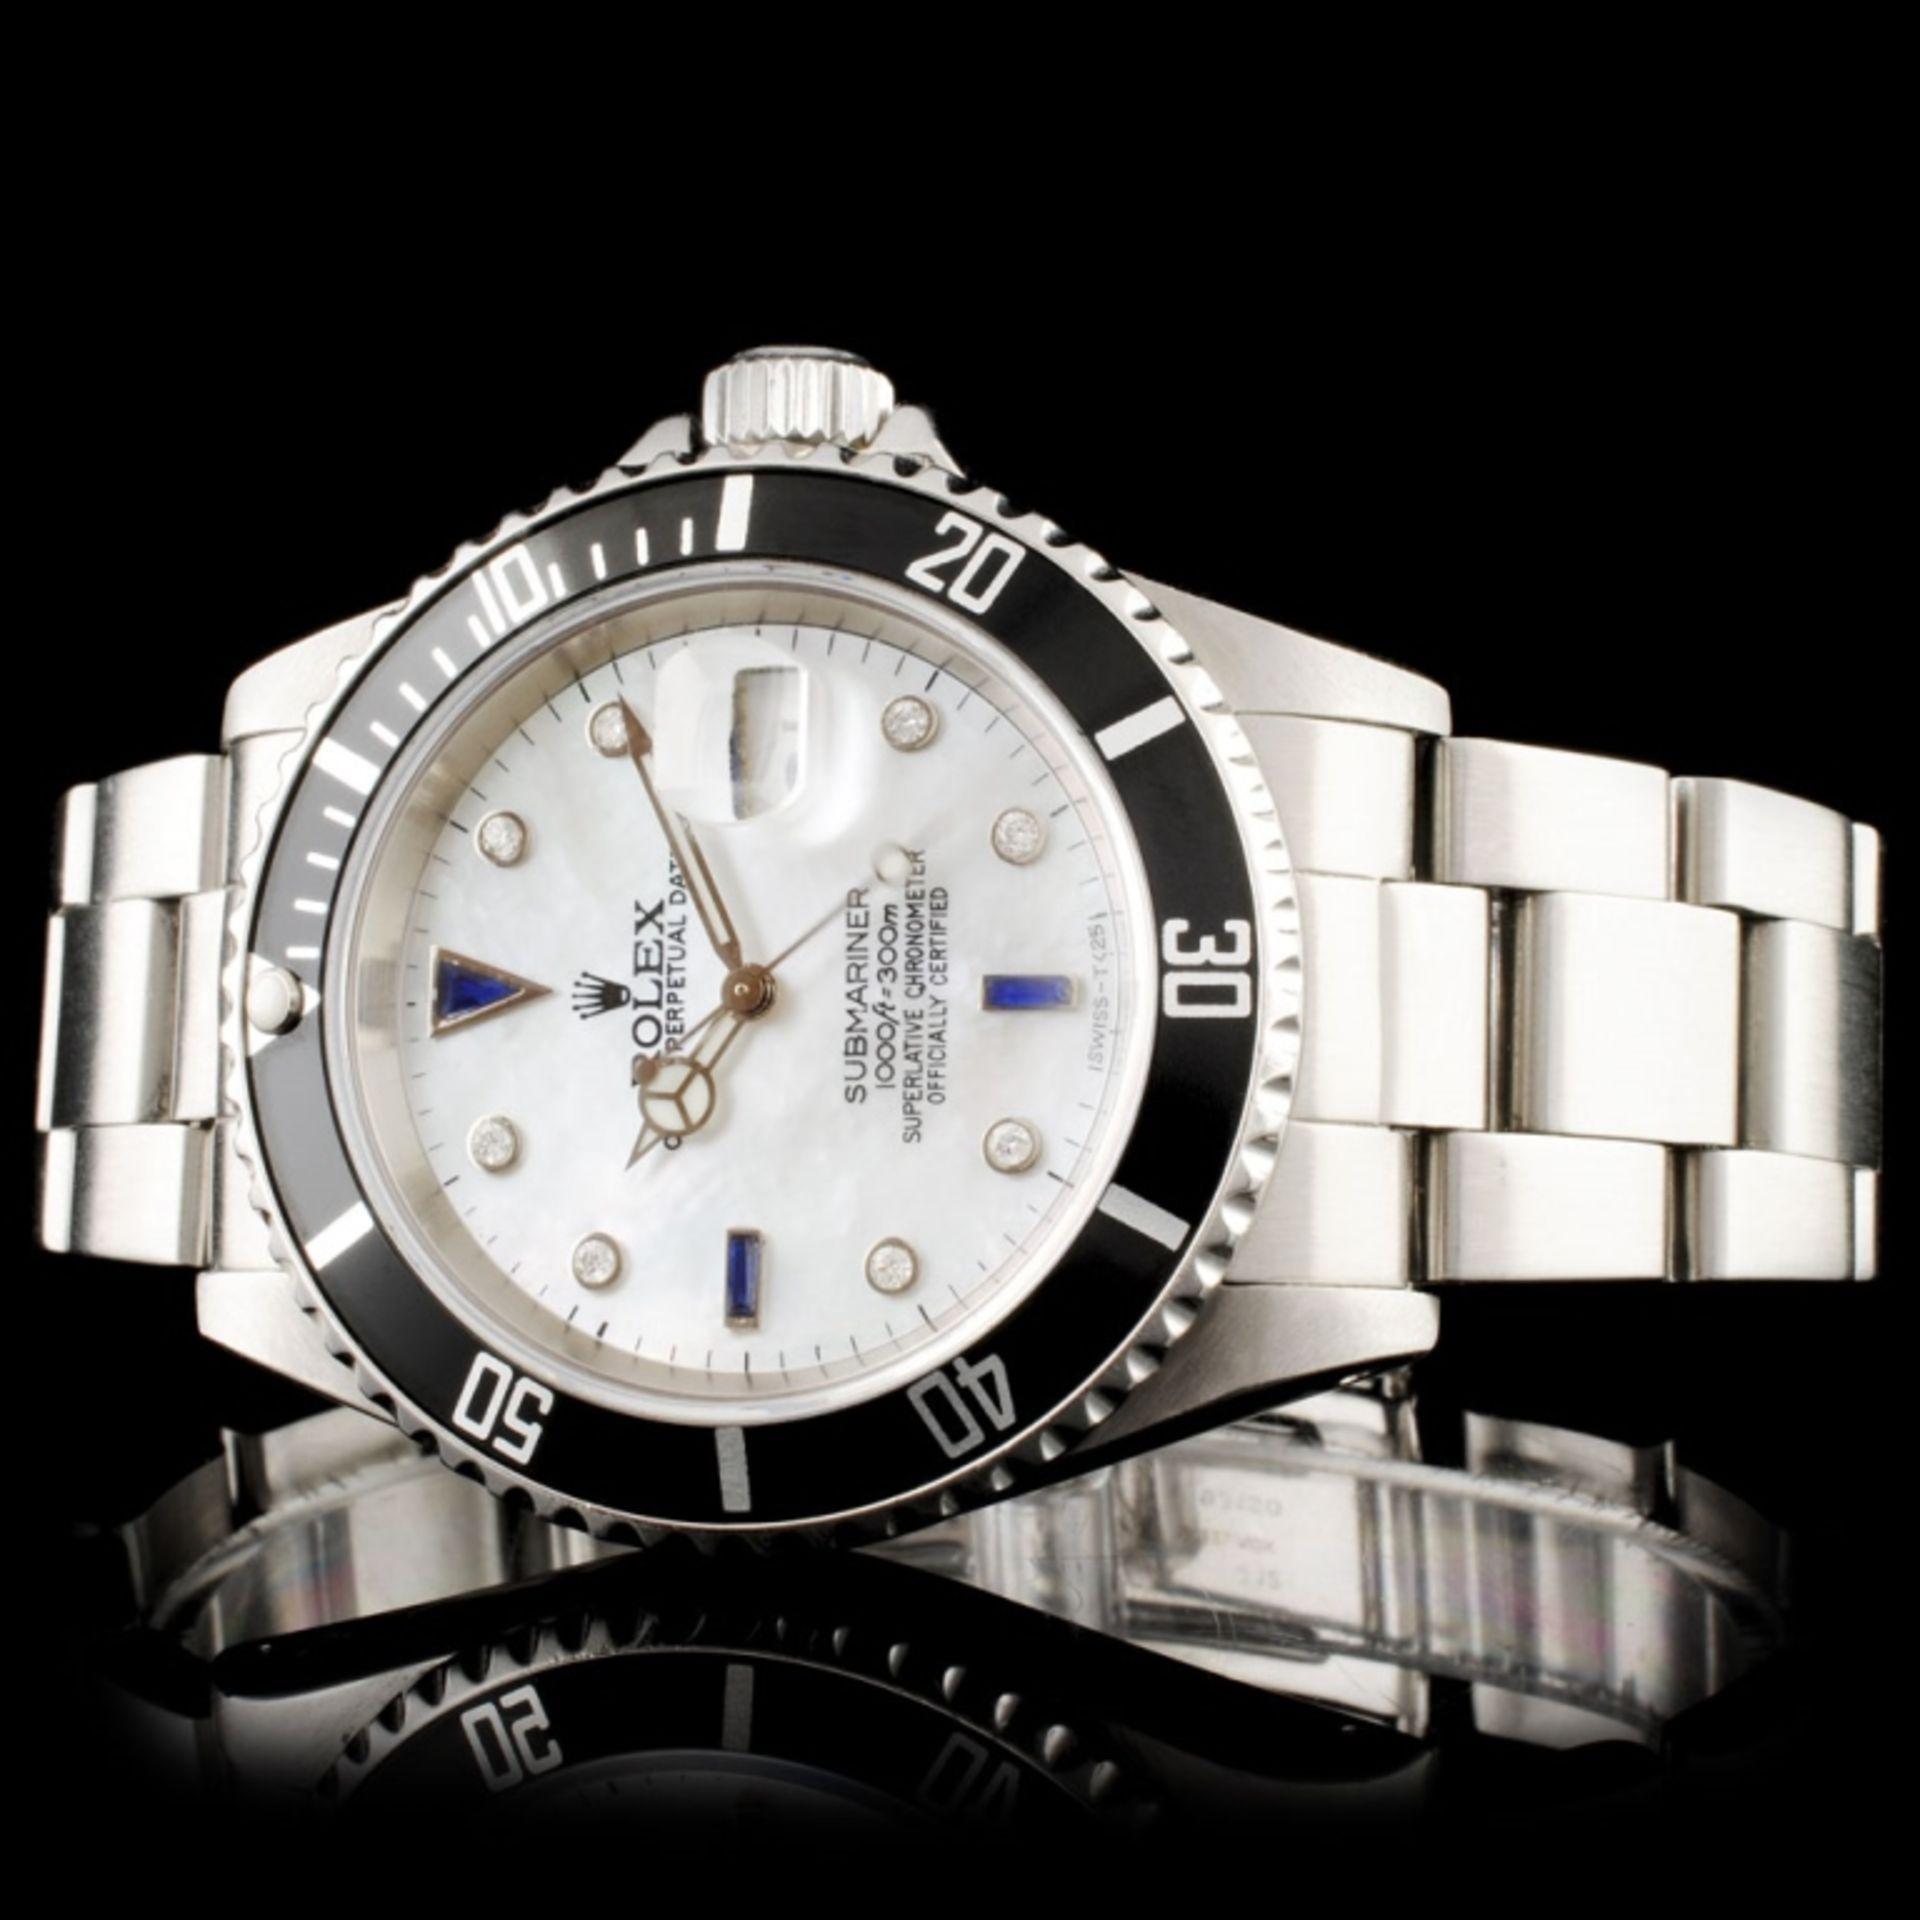 Rolex Submariner SS 40MM Diamond Wristwatch - Image 2 of 7